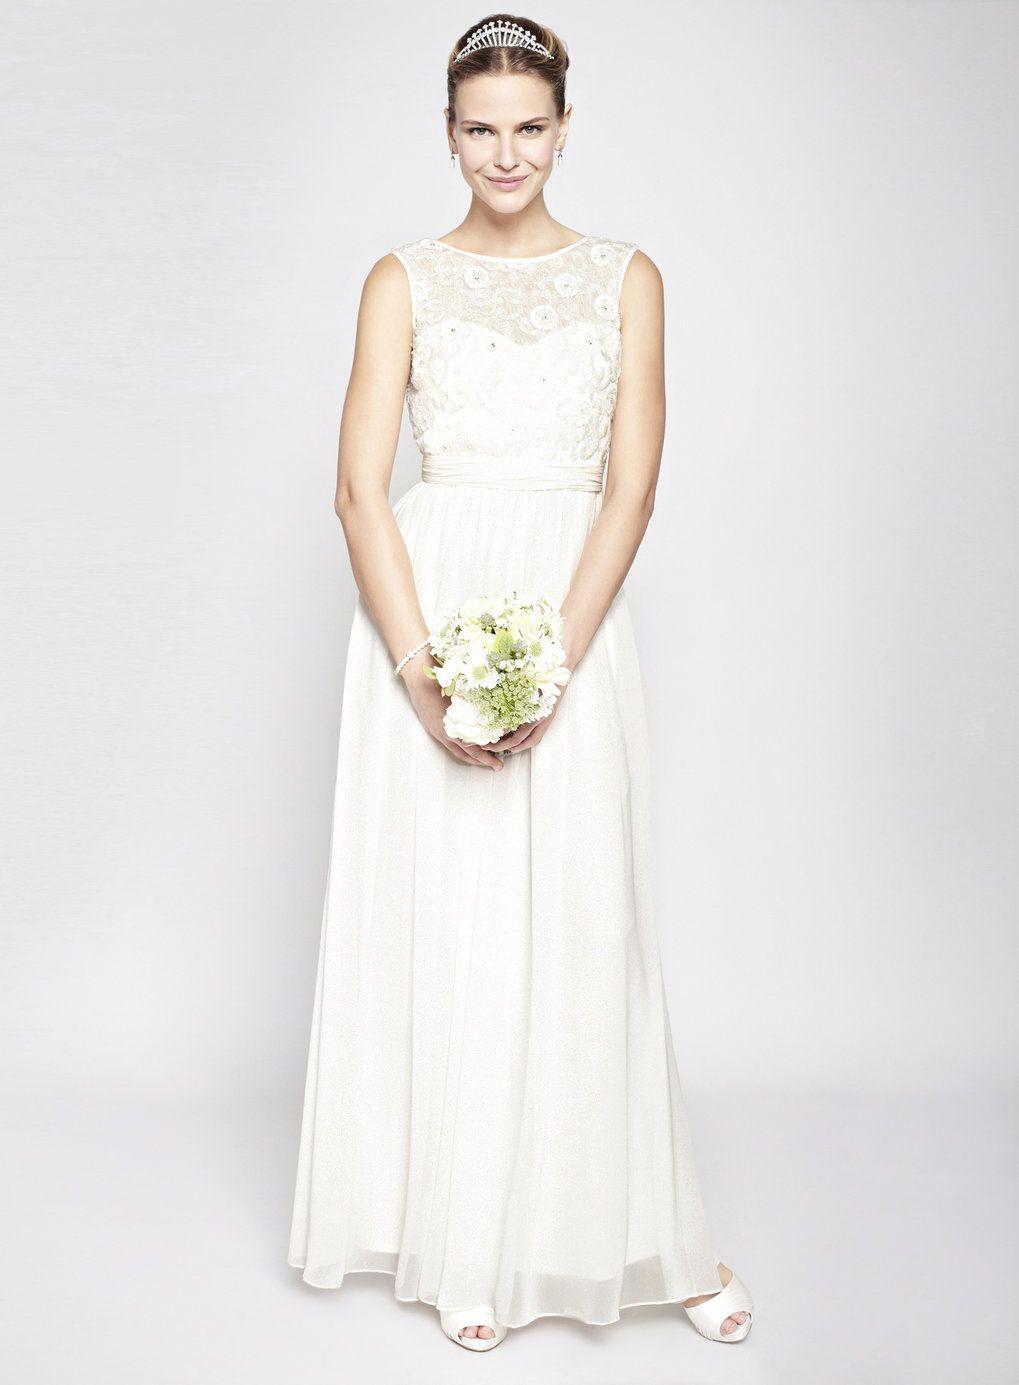 Wedding dress bhs vosoi bhs wedding dresses uk u2013 dress blog edin ombrellifo Gallery